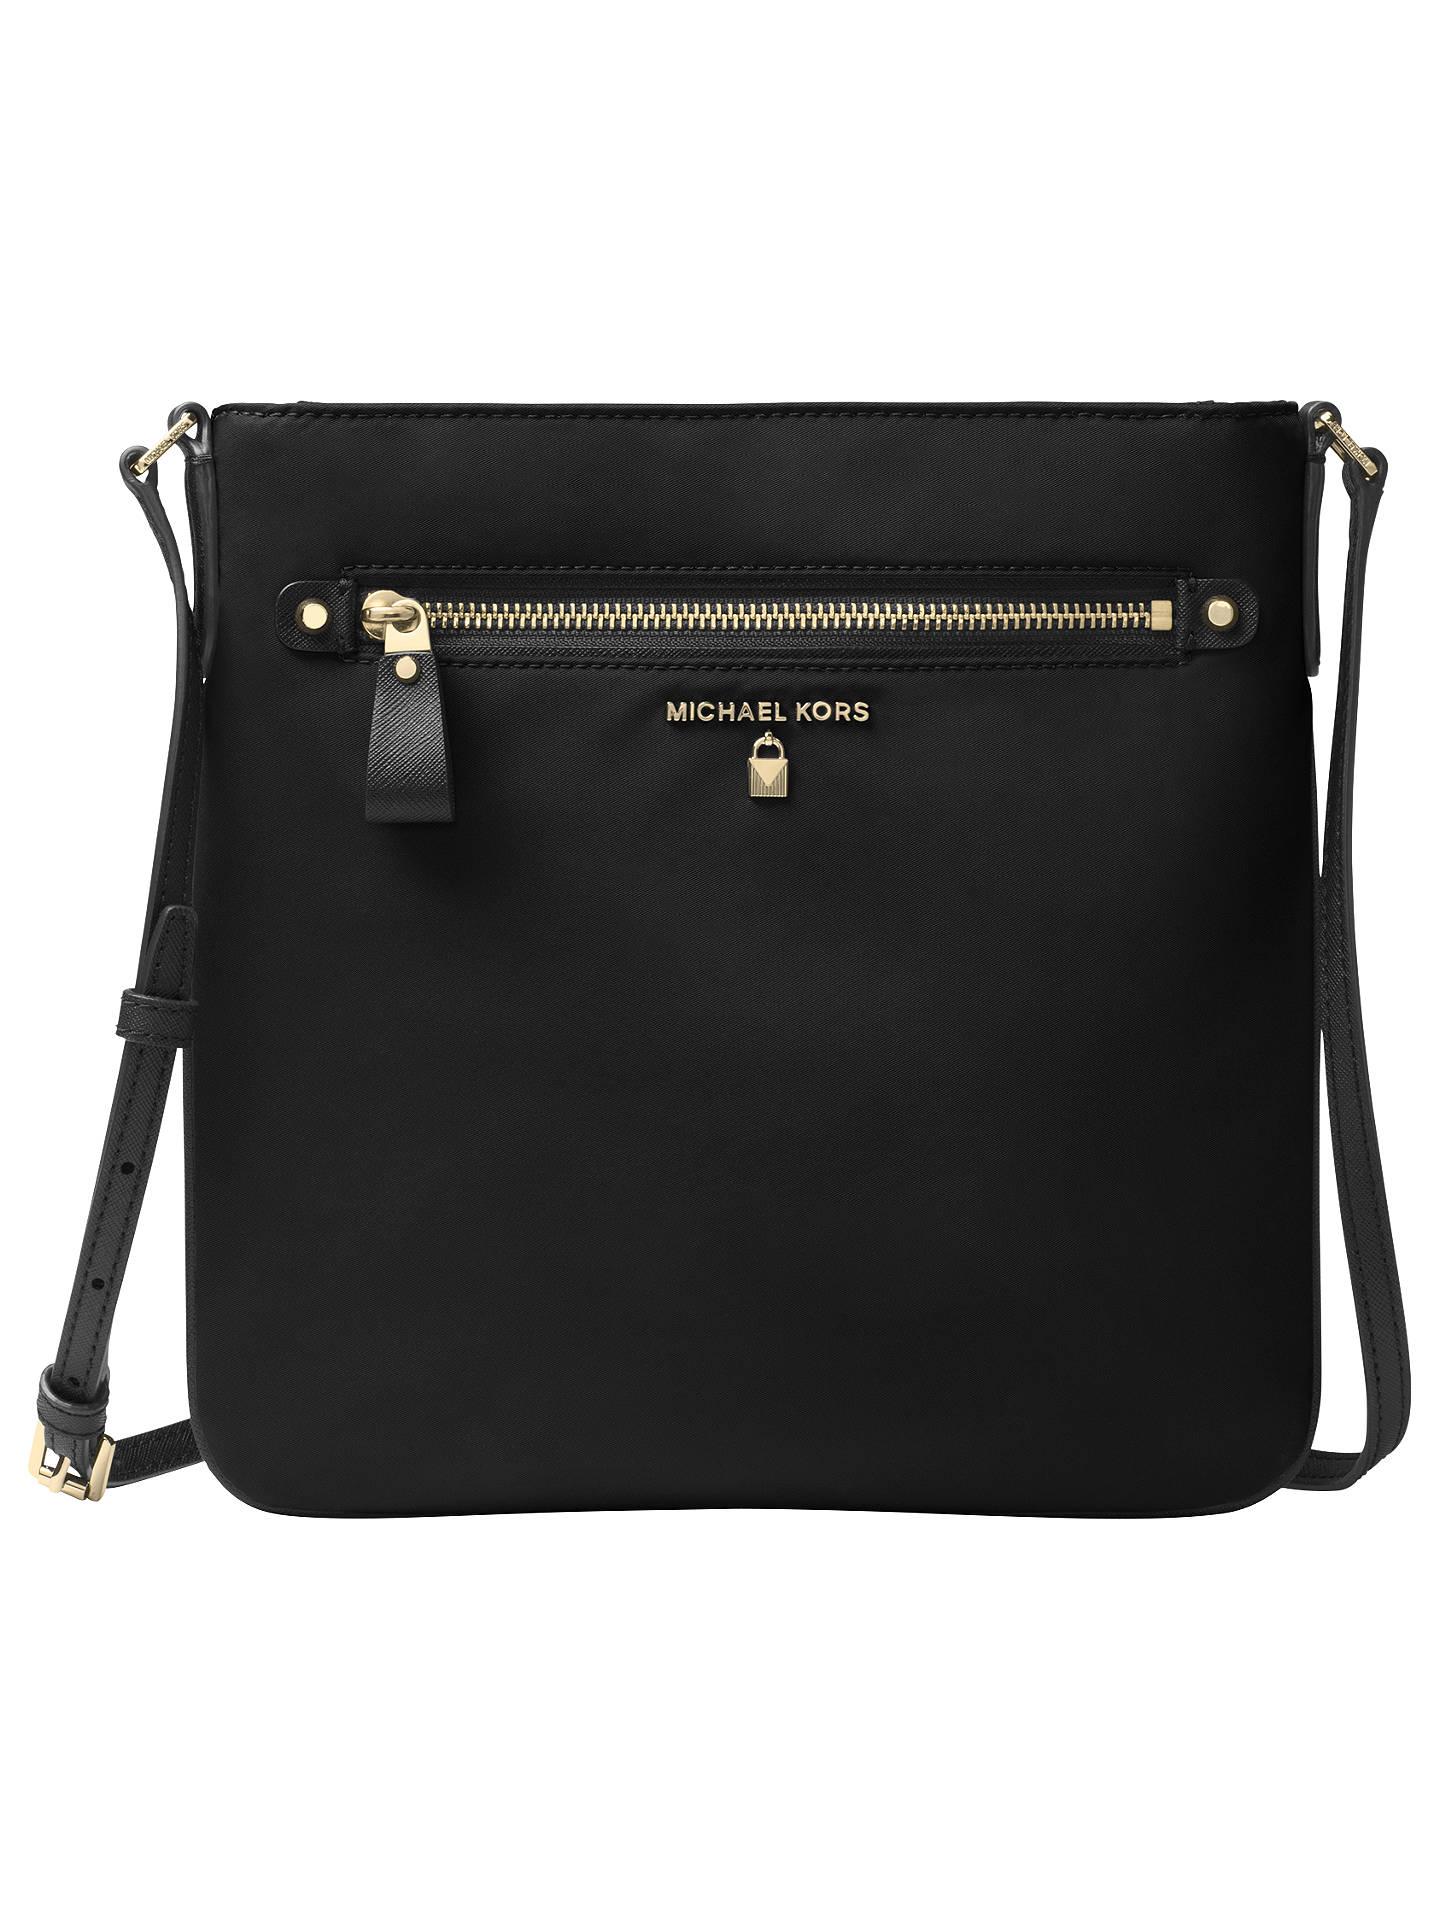 51b582bfb67f Buy MICHAEL Michael Kors Kelsey Large Cross Body Bag, Black Online at  johnlewis.com ...